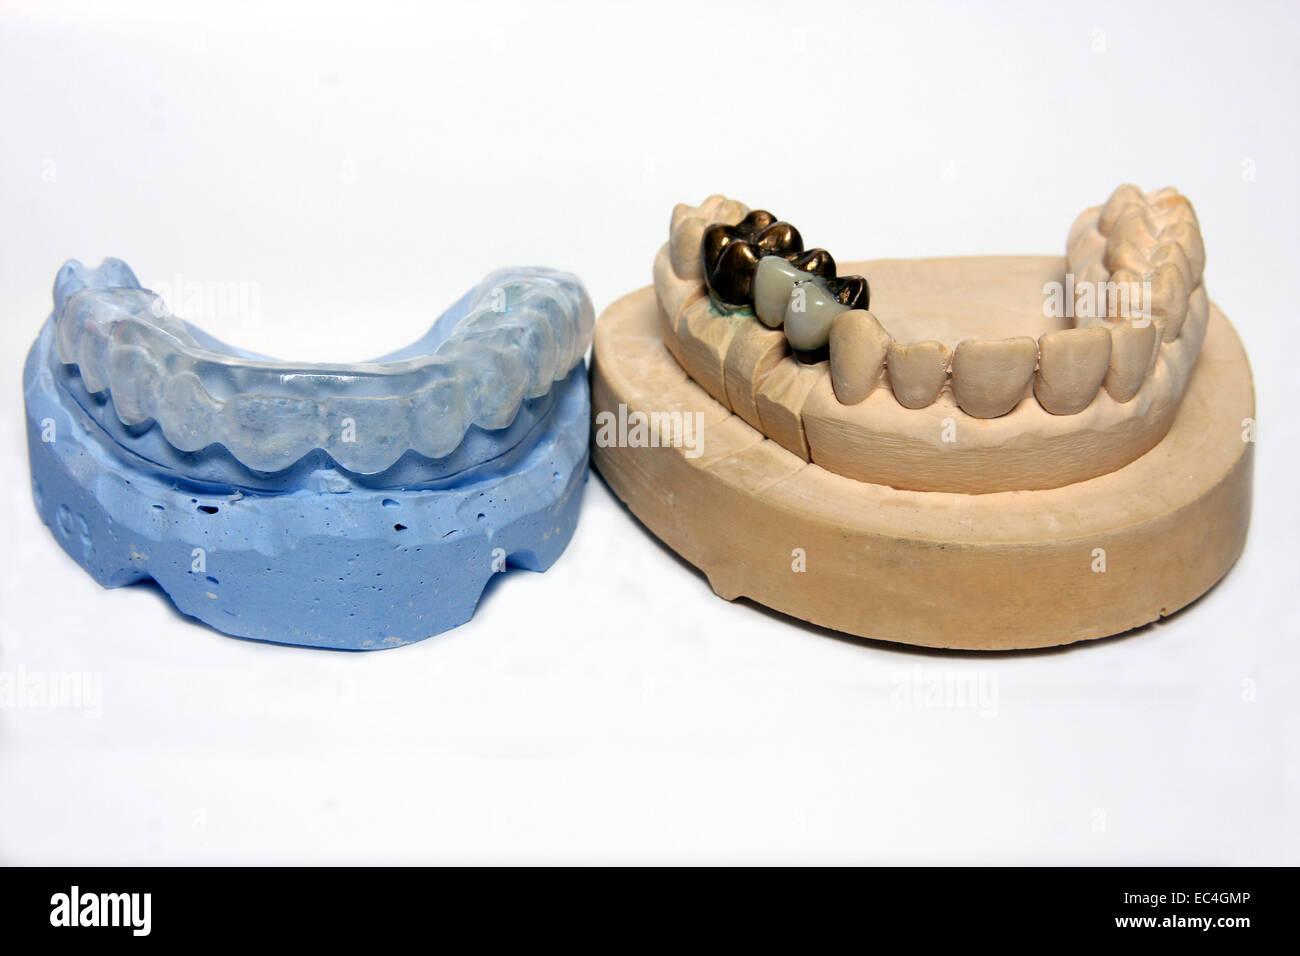 denture - Stock Image